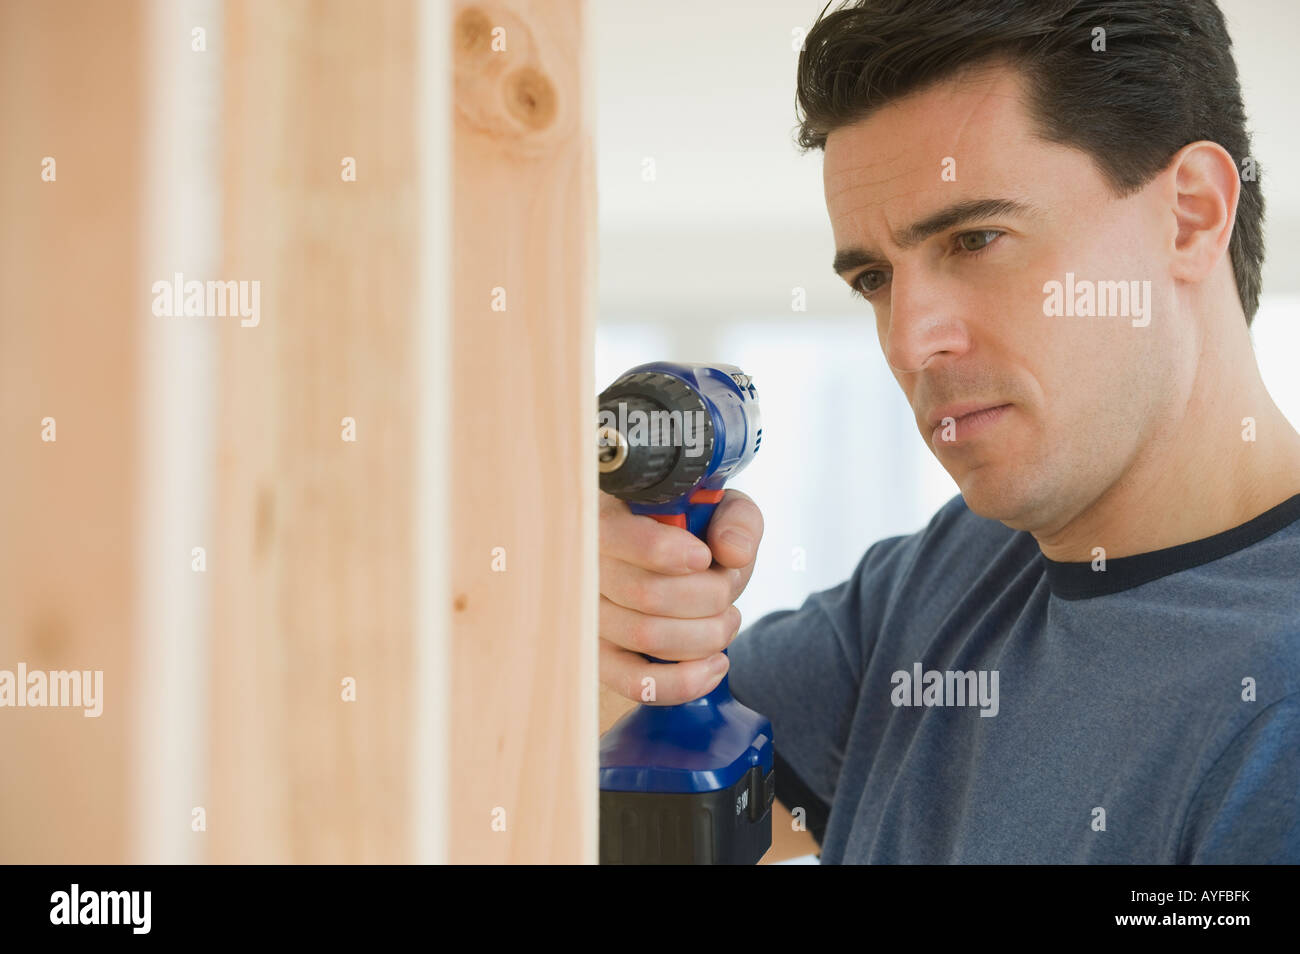 Man using cordless drill - Stock Image